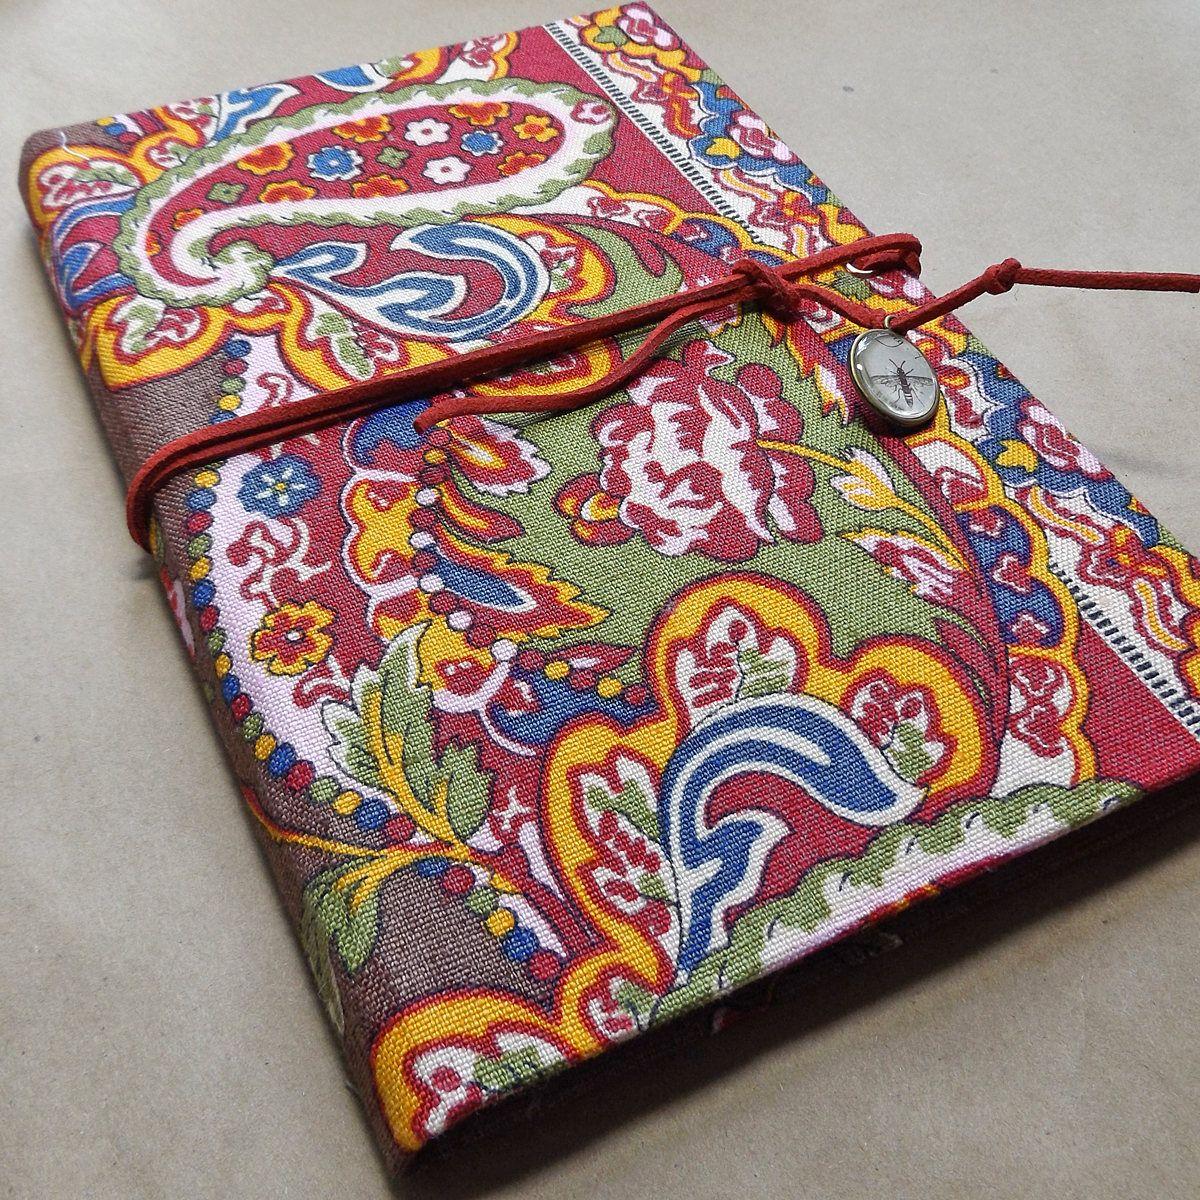 "Handmade Journal, Blank Book, 6 3/4"" X 8 3/4"", 24 Lb Lined"